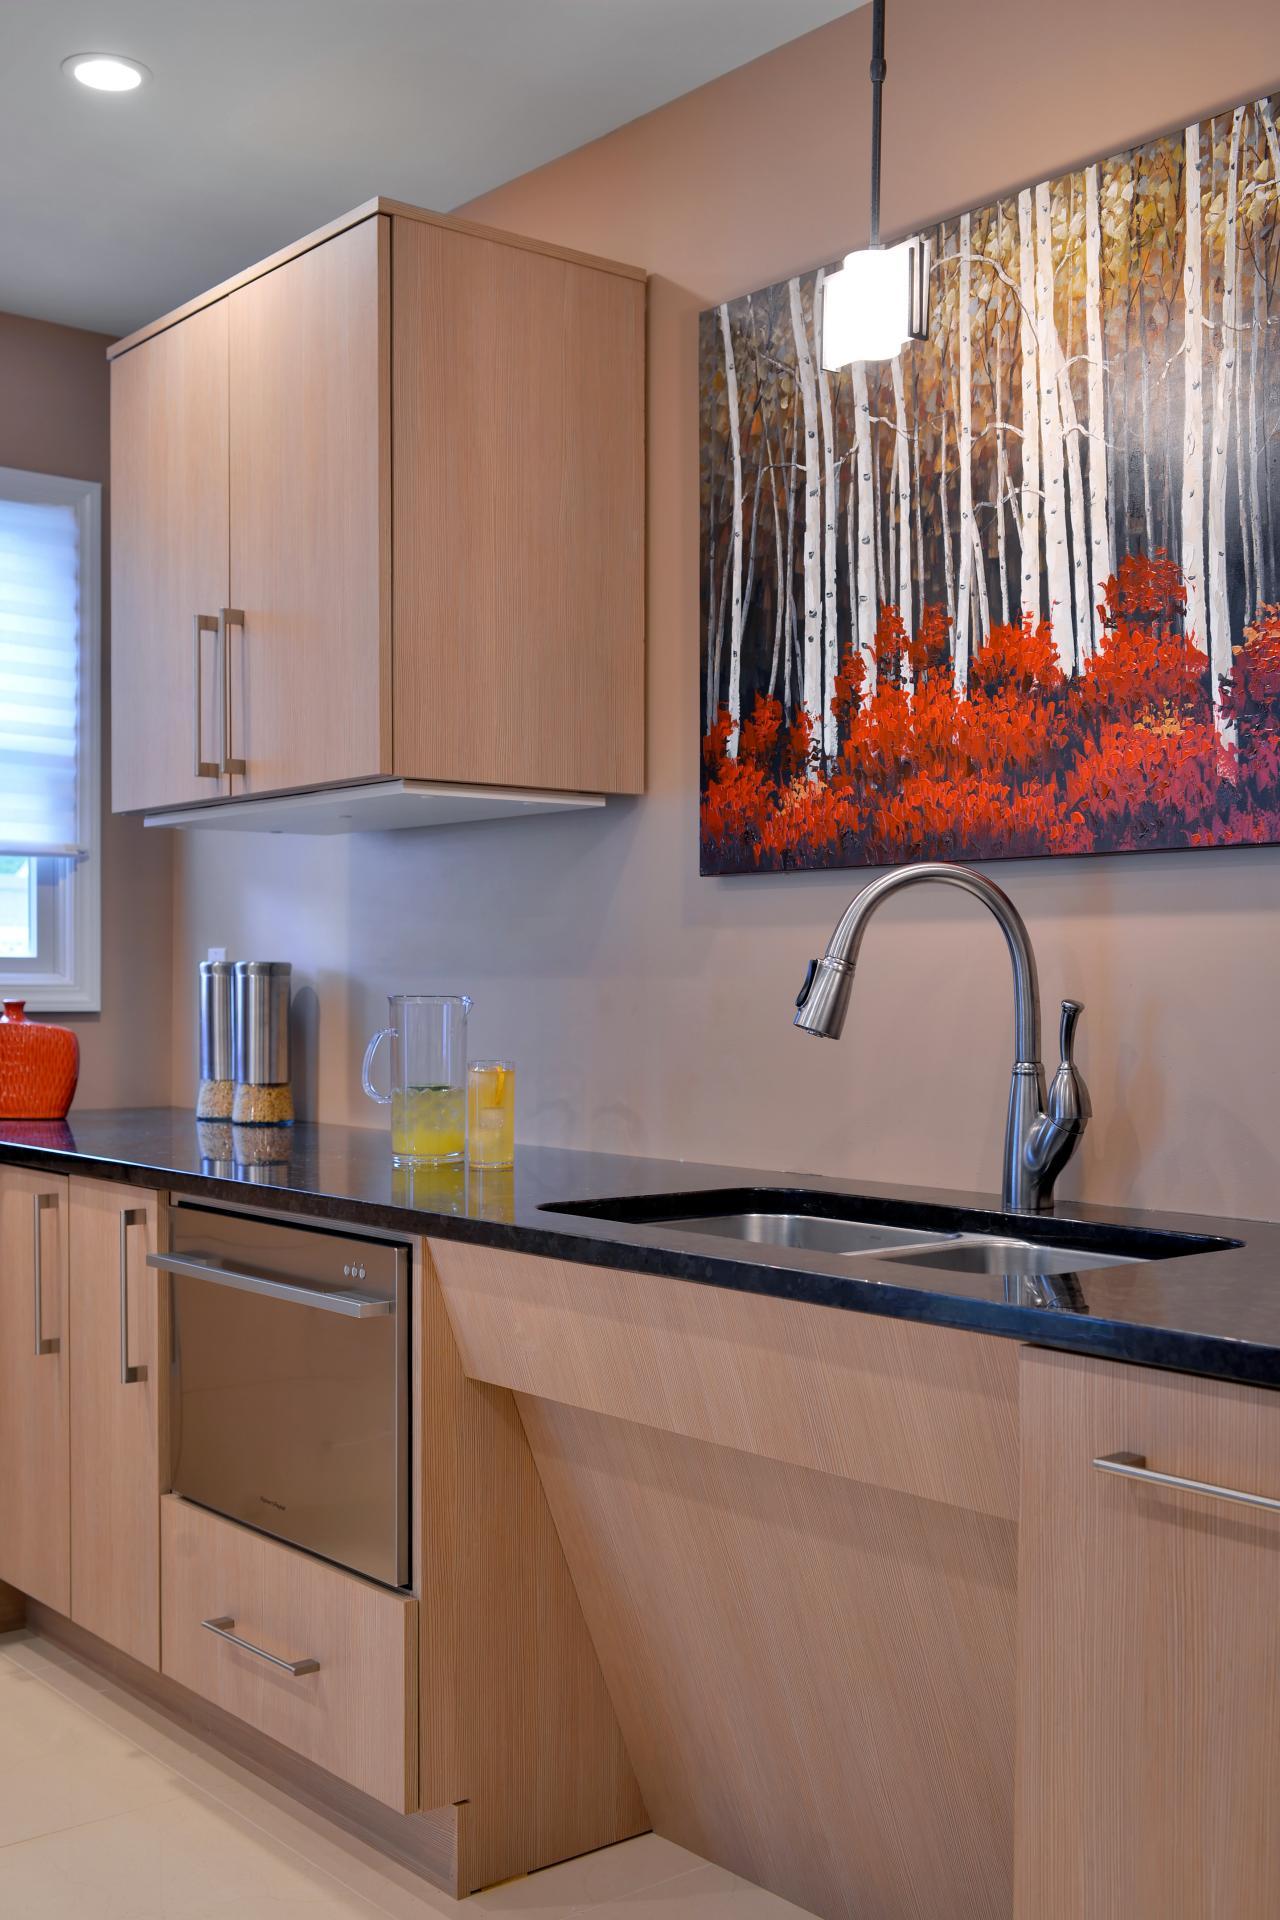 Ada Compliant Kitchen With Sleek Light Cabinets Hgtv